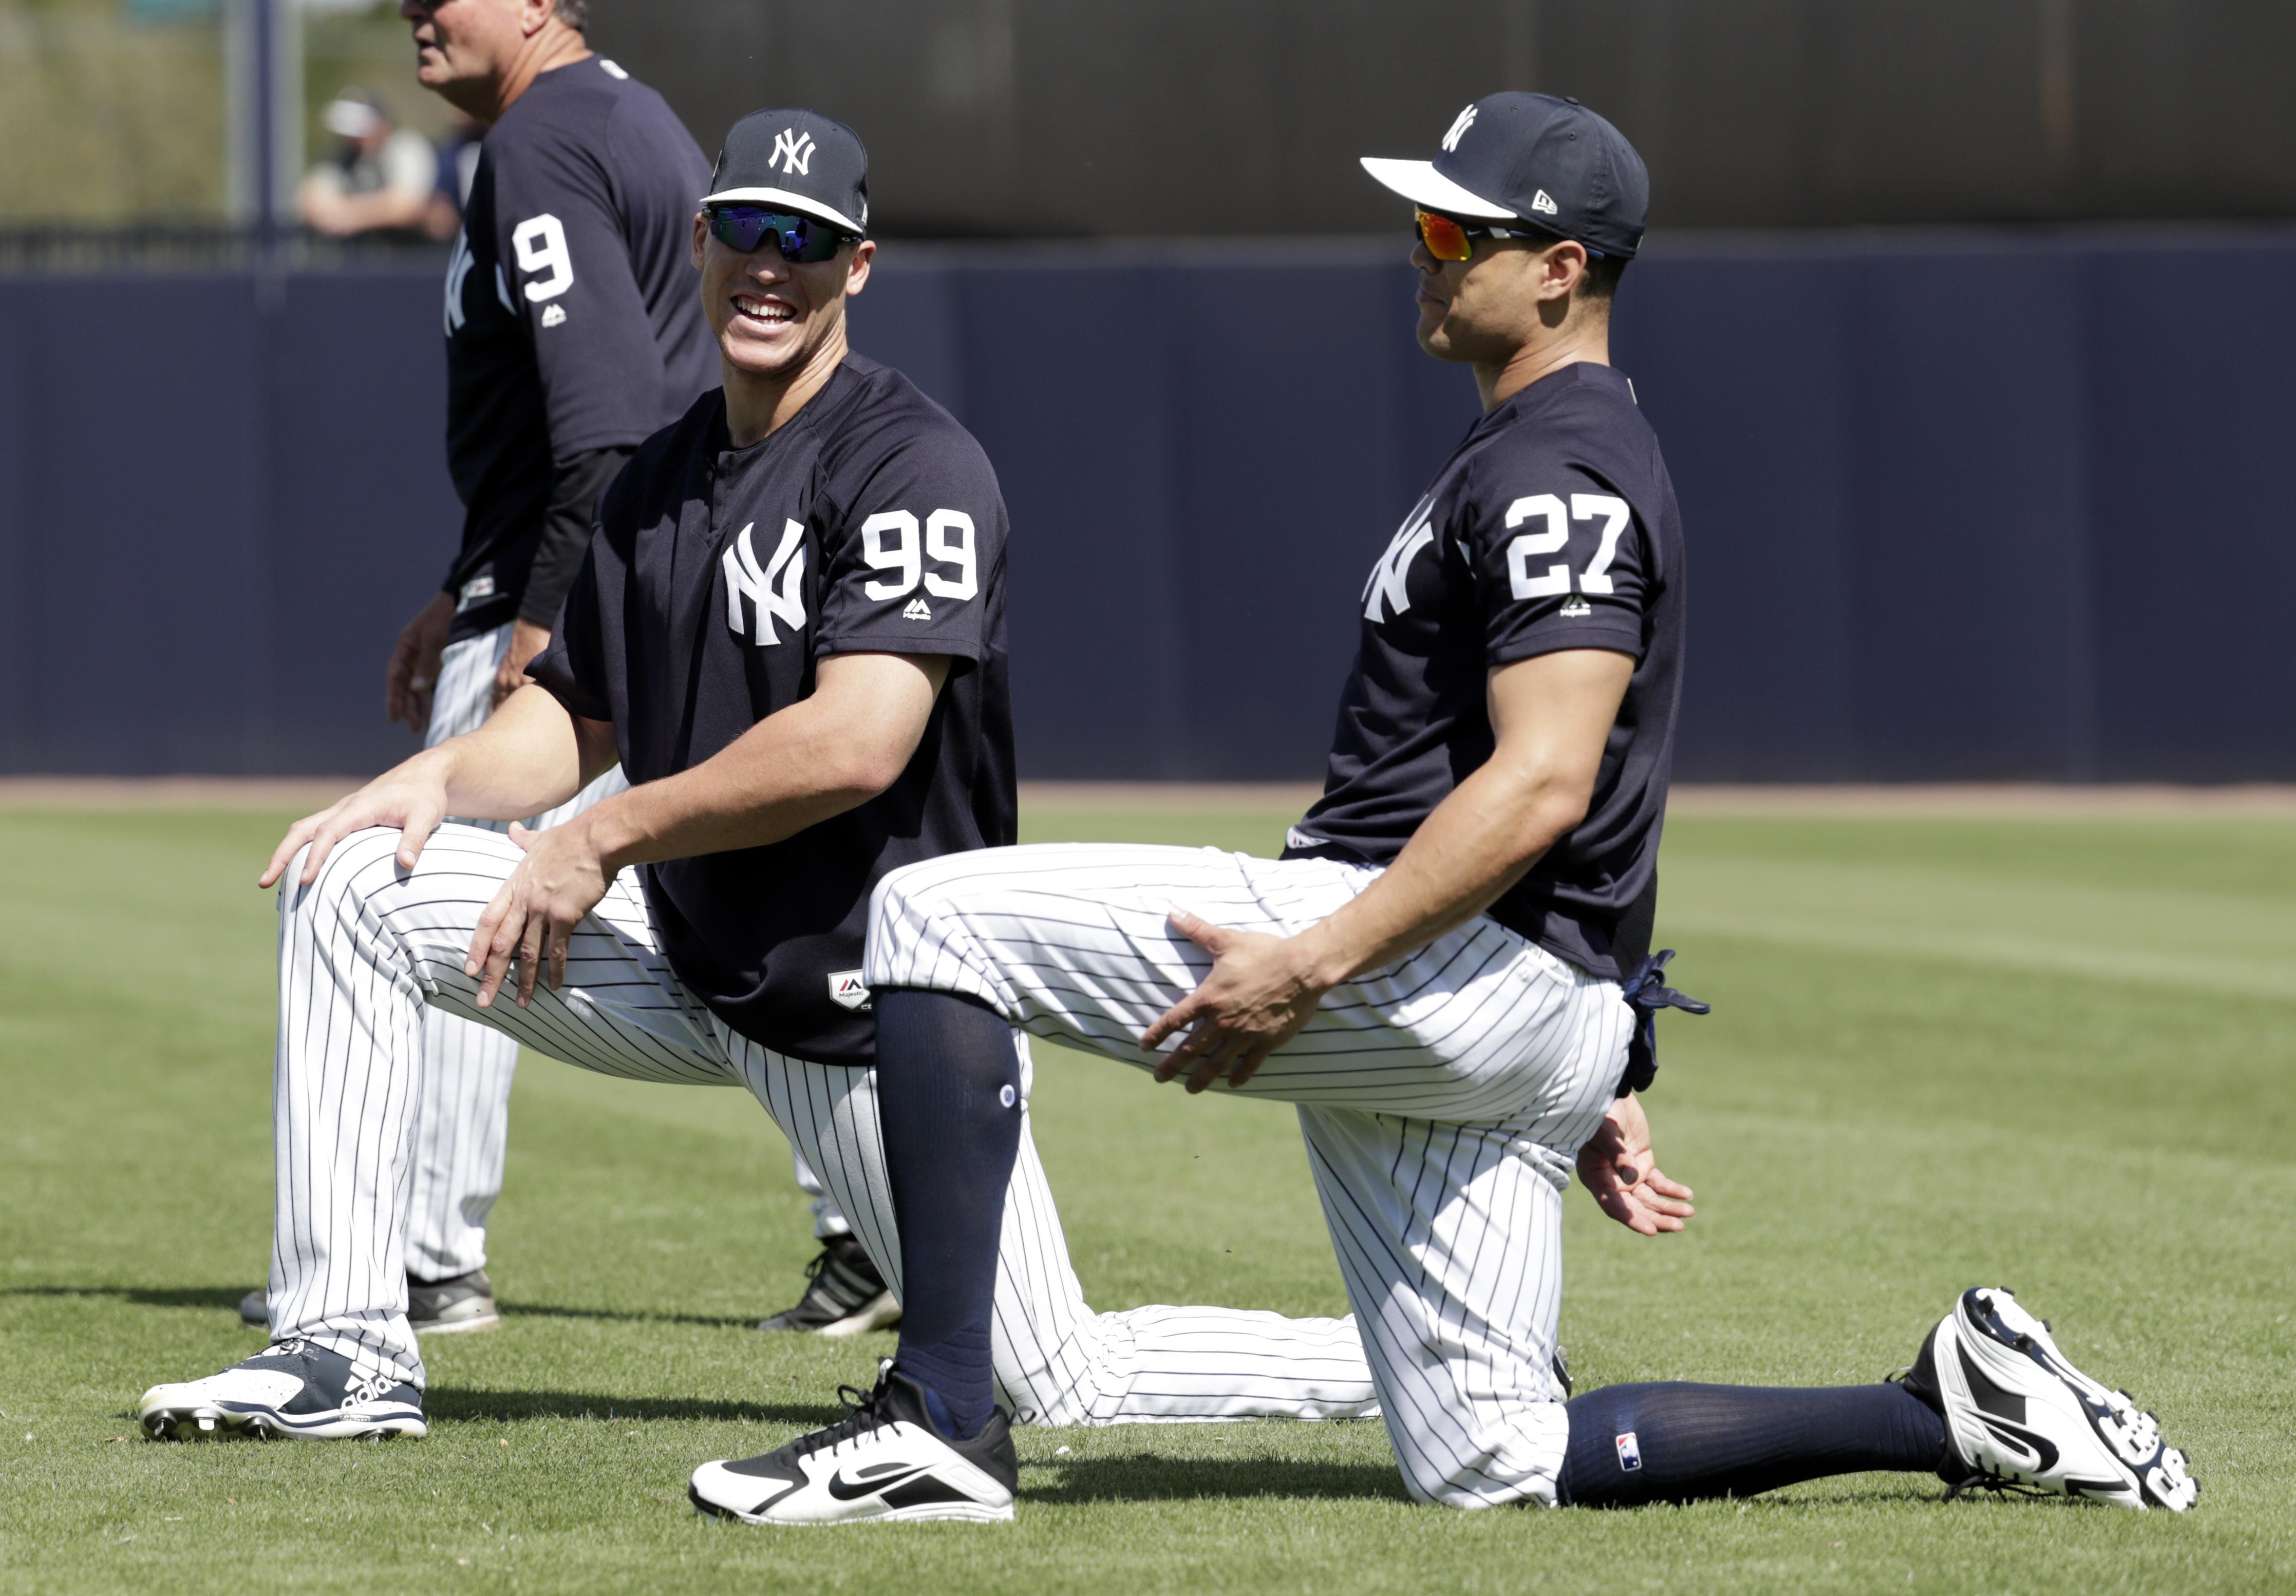 Yankees_spring_baseball_44881